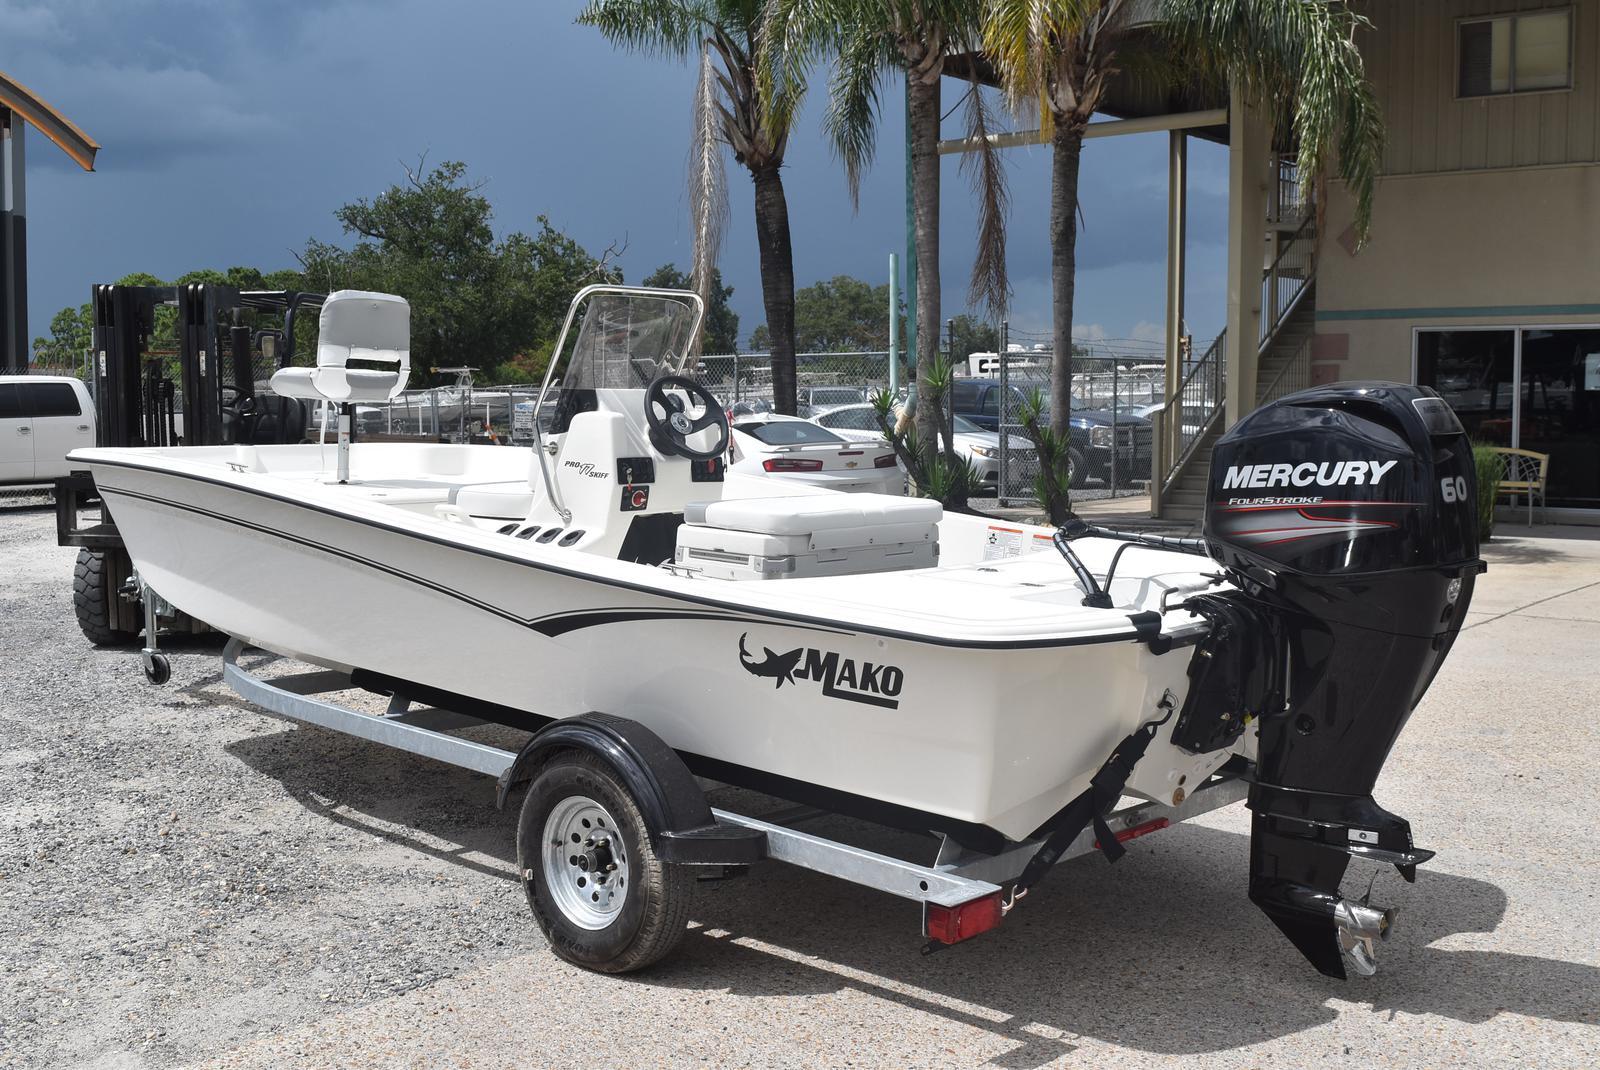 2020 Mako boat for sale, model of the boat is Pro Skiff 17, 75 ELPT & Image # 3 of 9